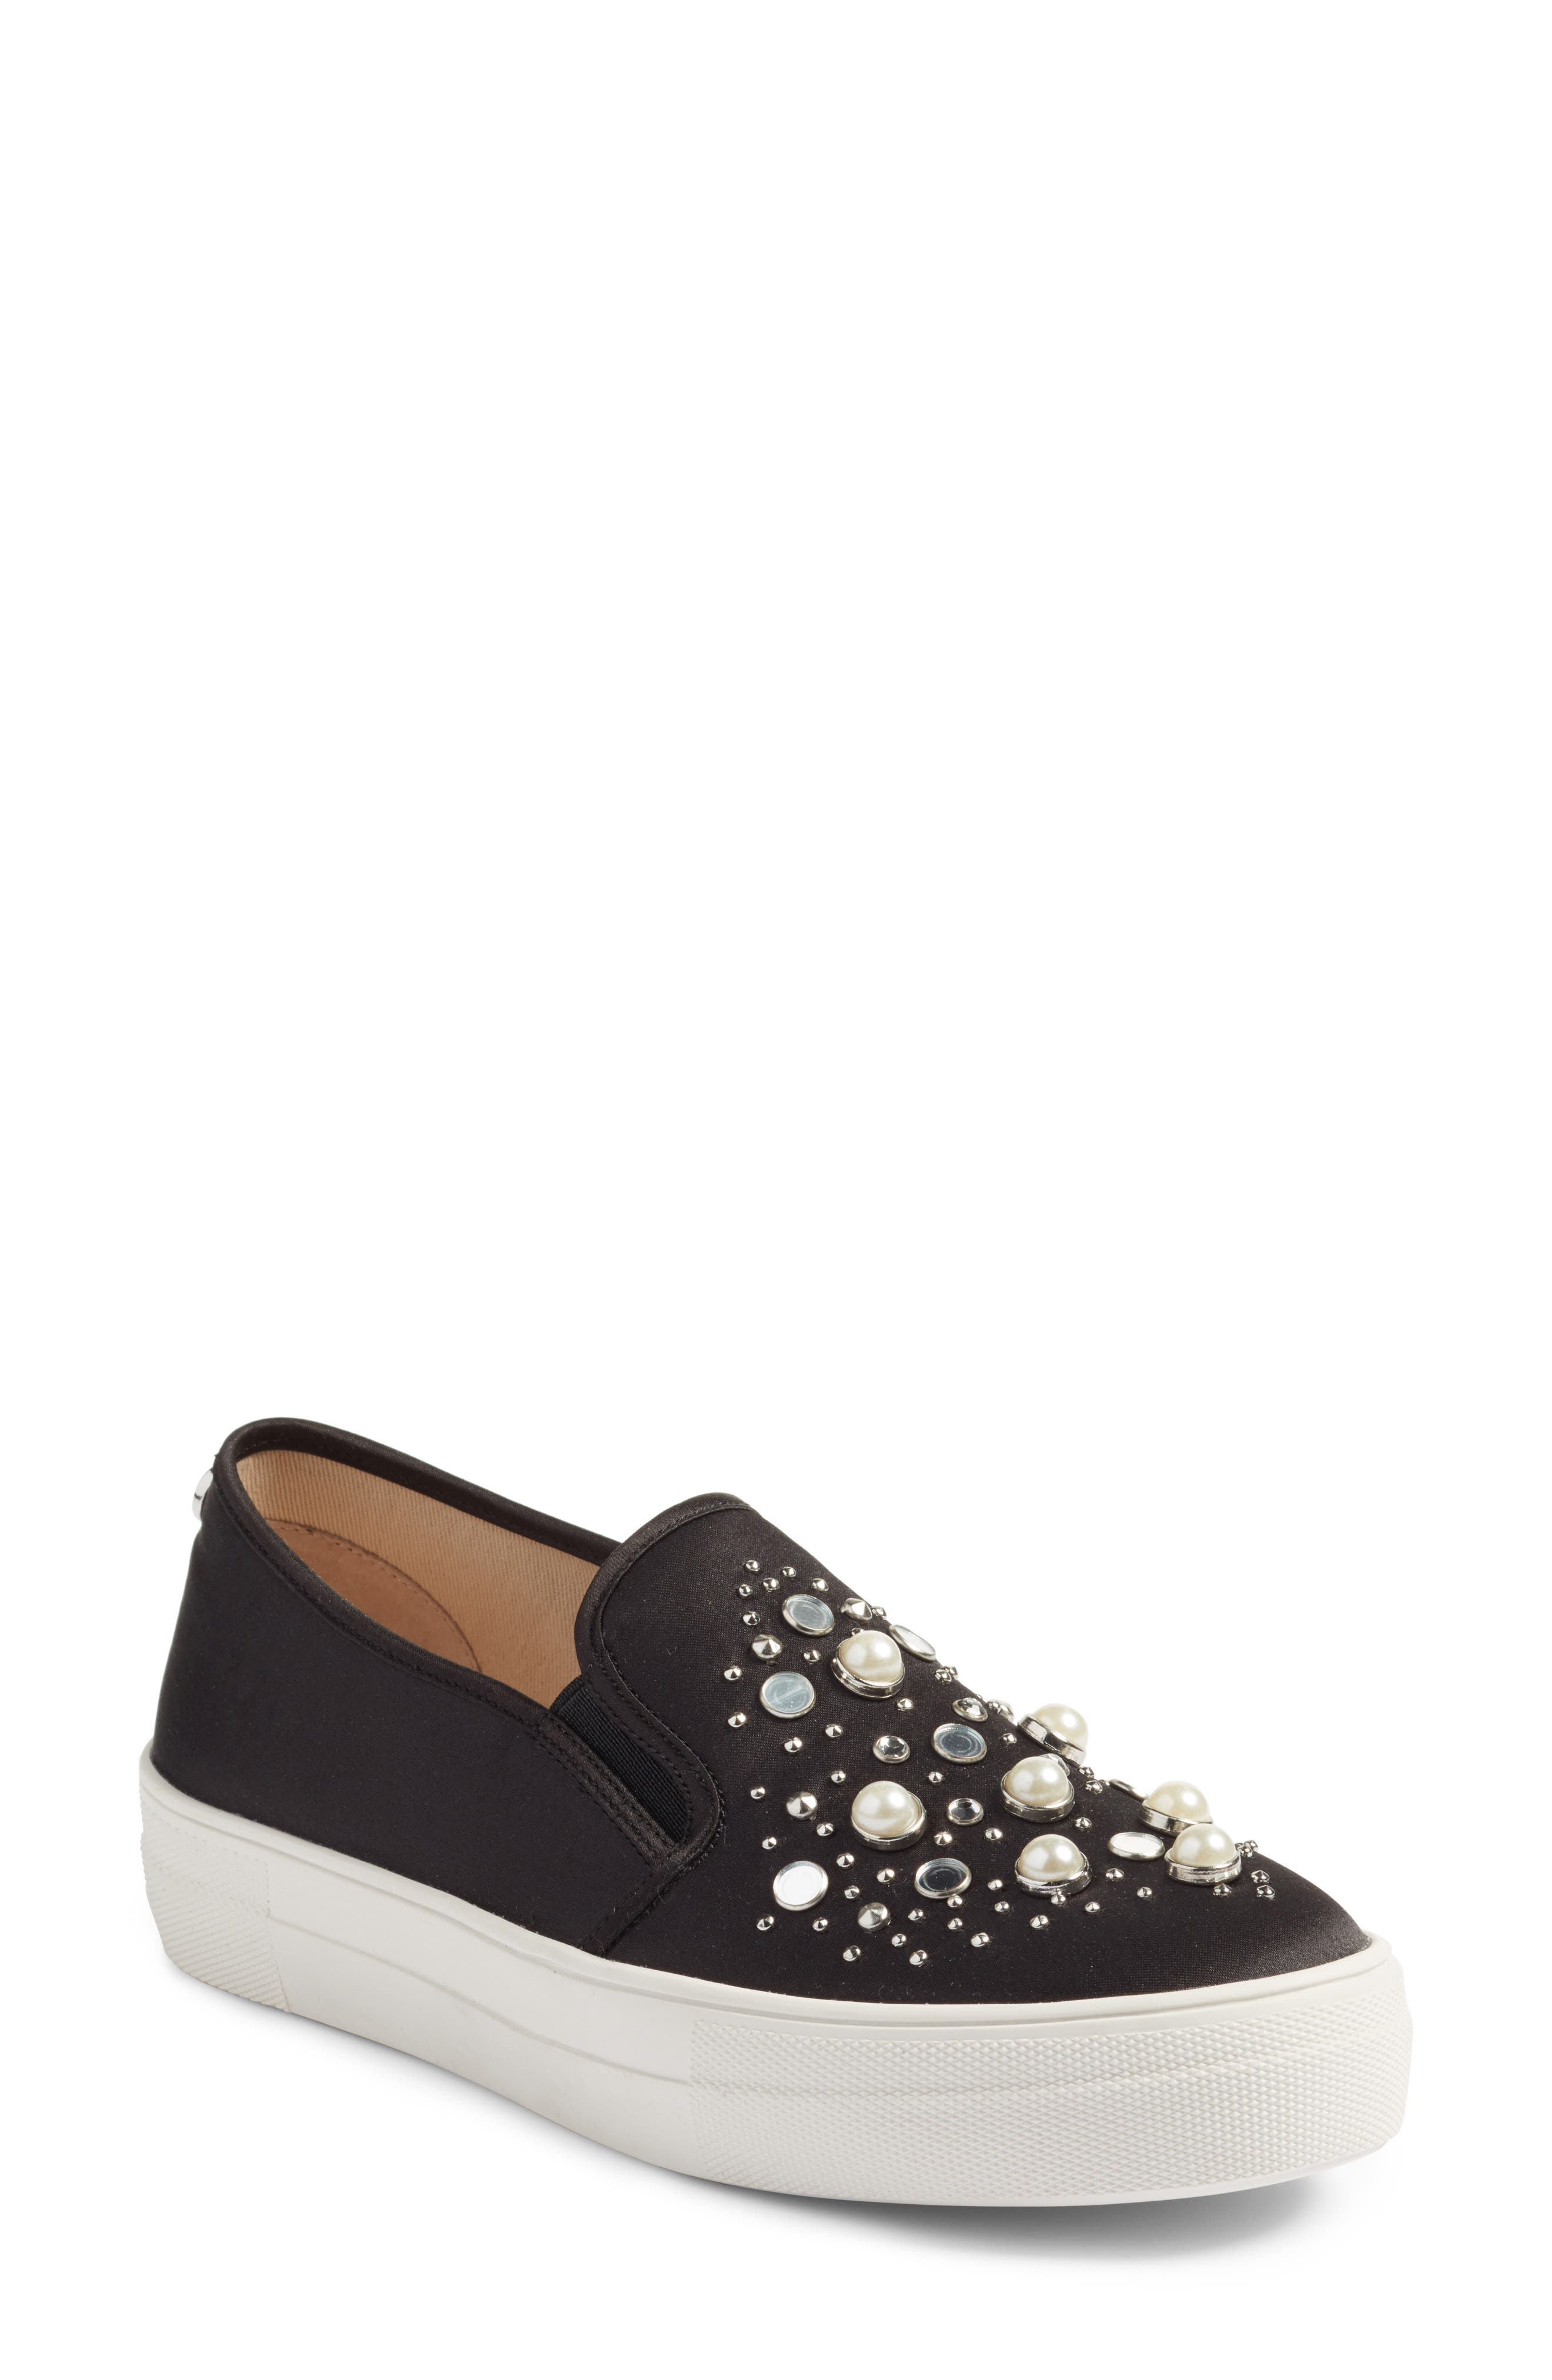 Glade Embellished Slip-On Sneaker,                             Main thumbnail 1, color,                             001